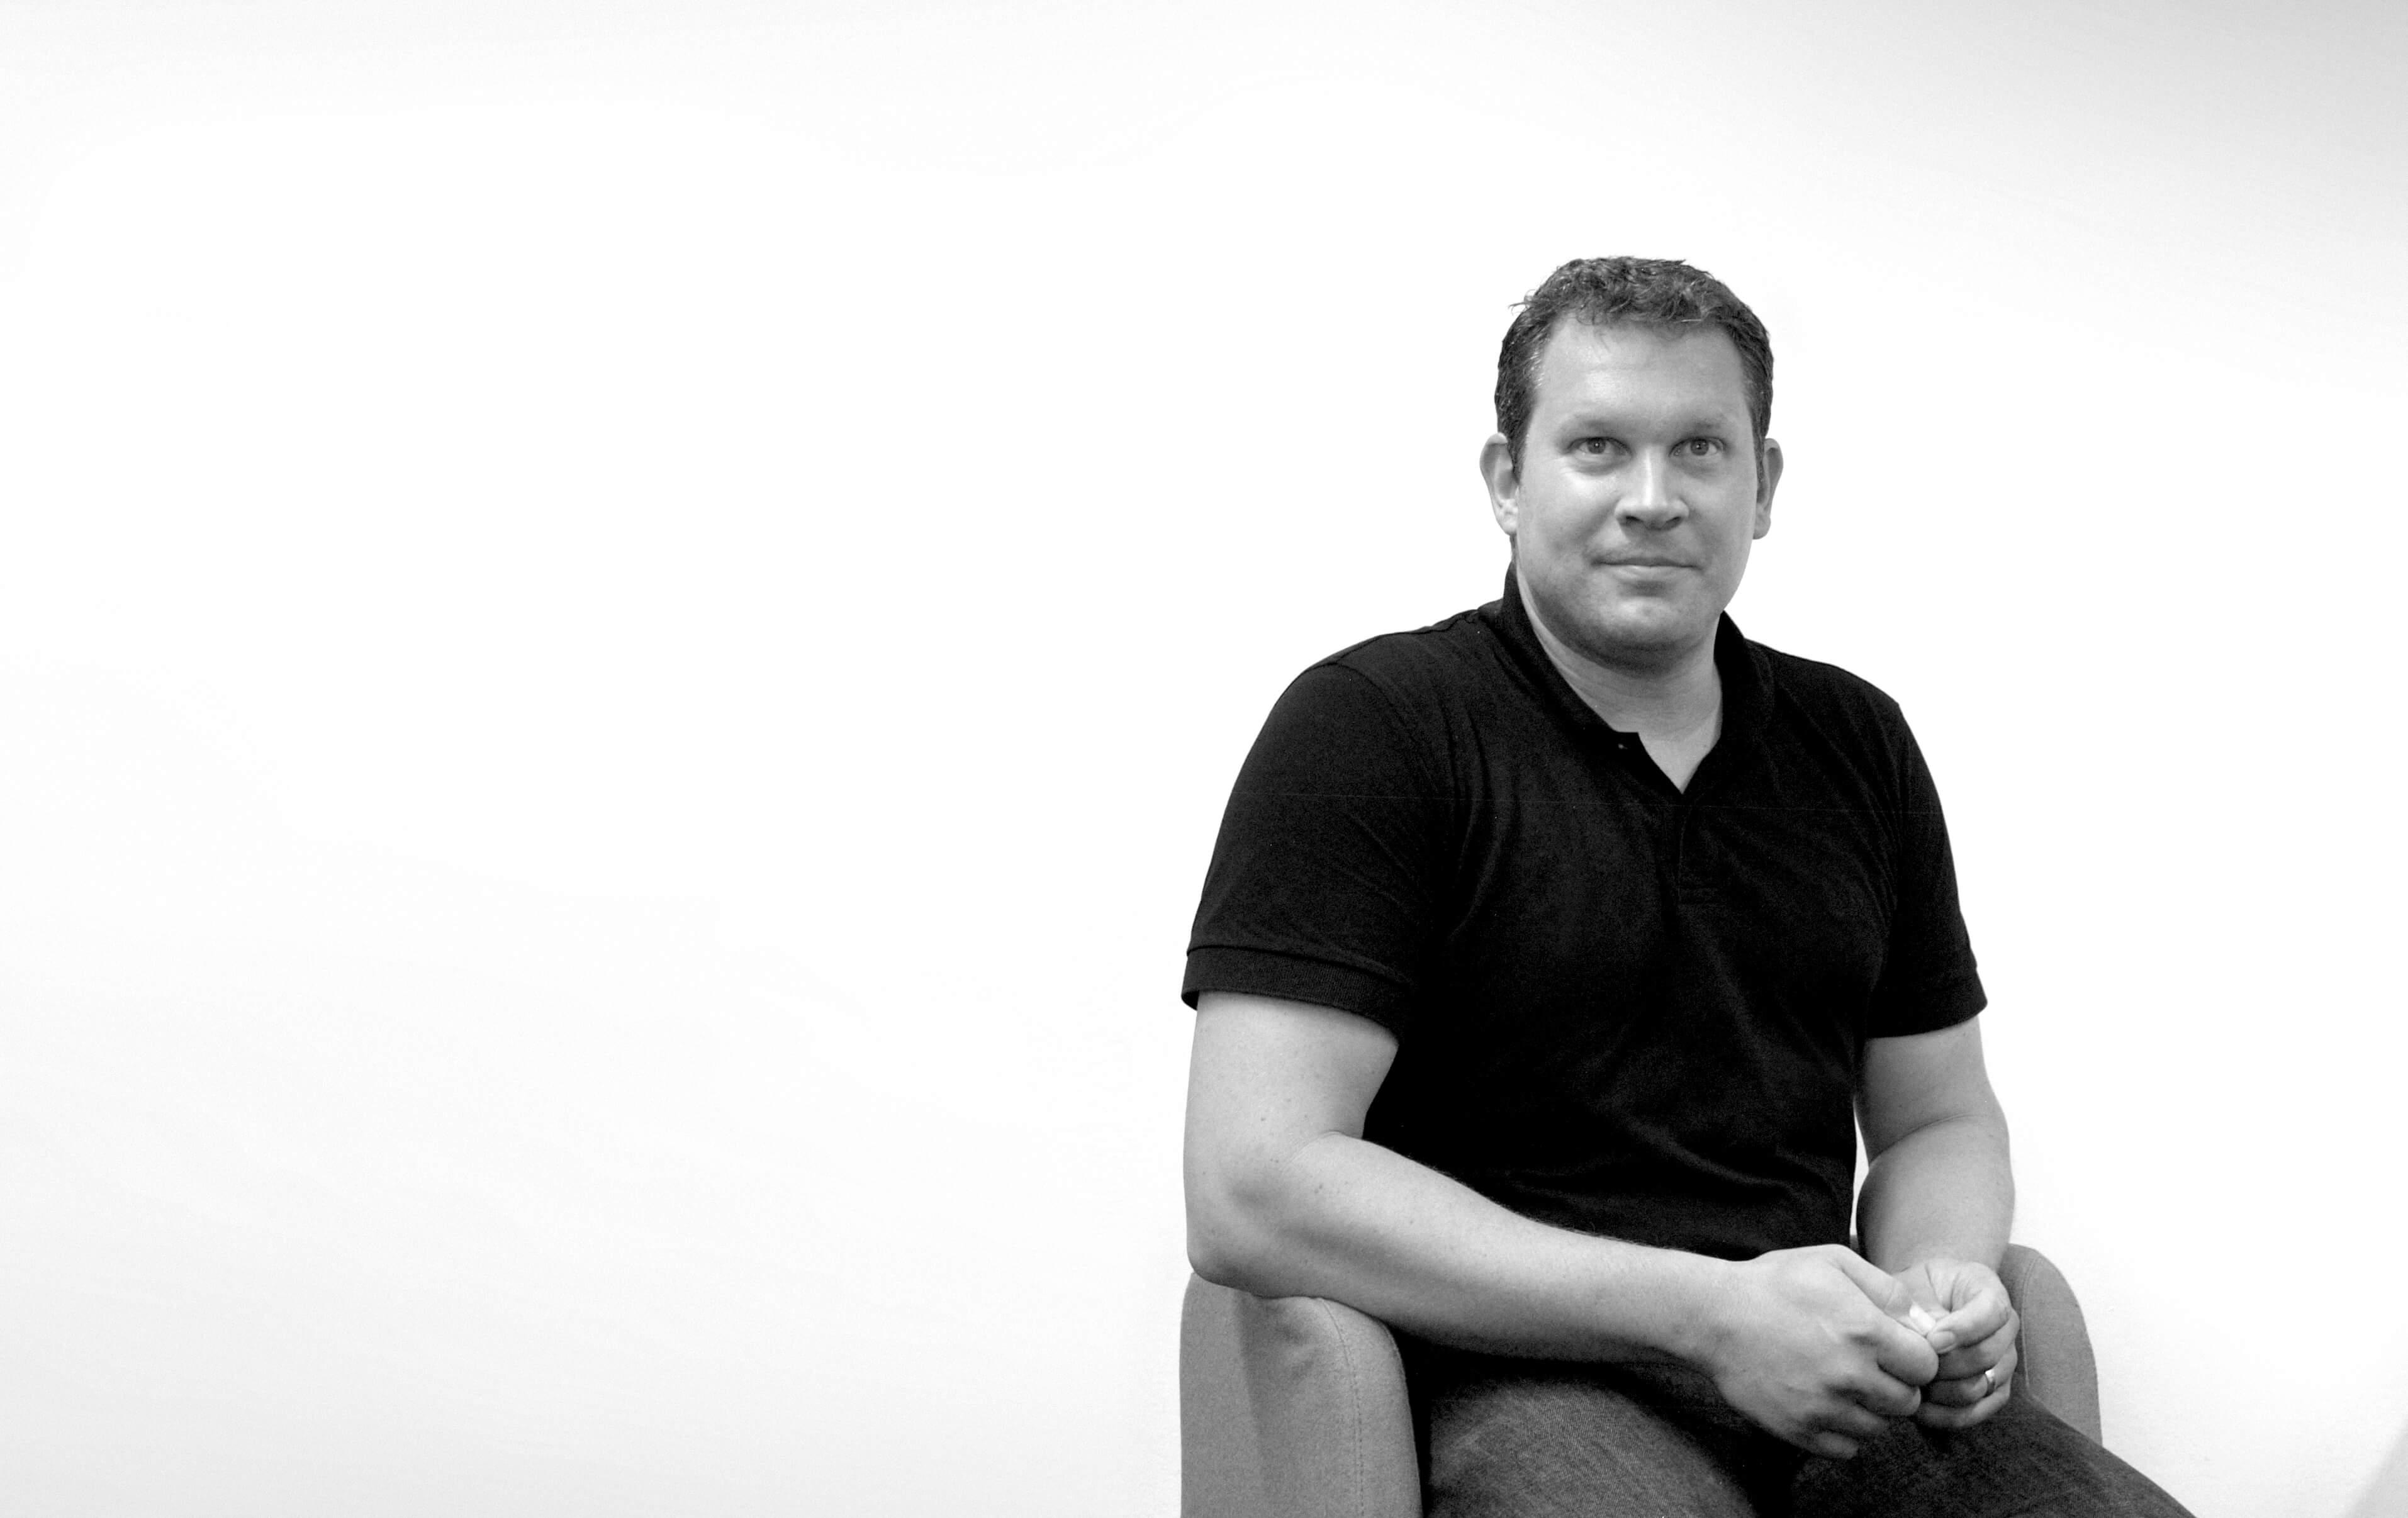 Jens Wehrmann Ceo Mobile Software AG auf einem Stuhl